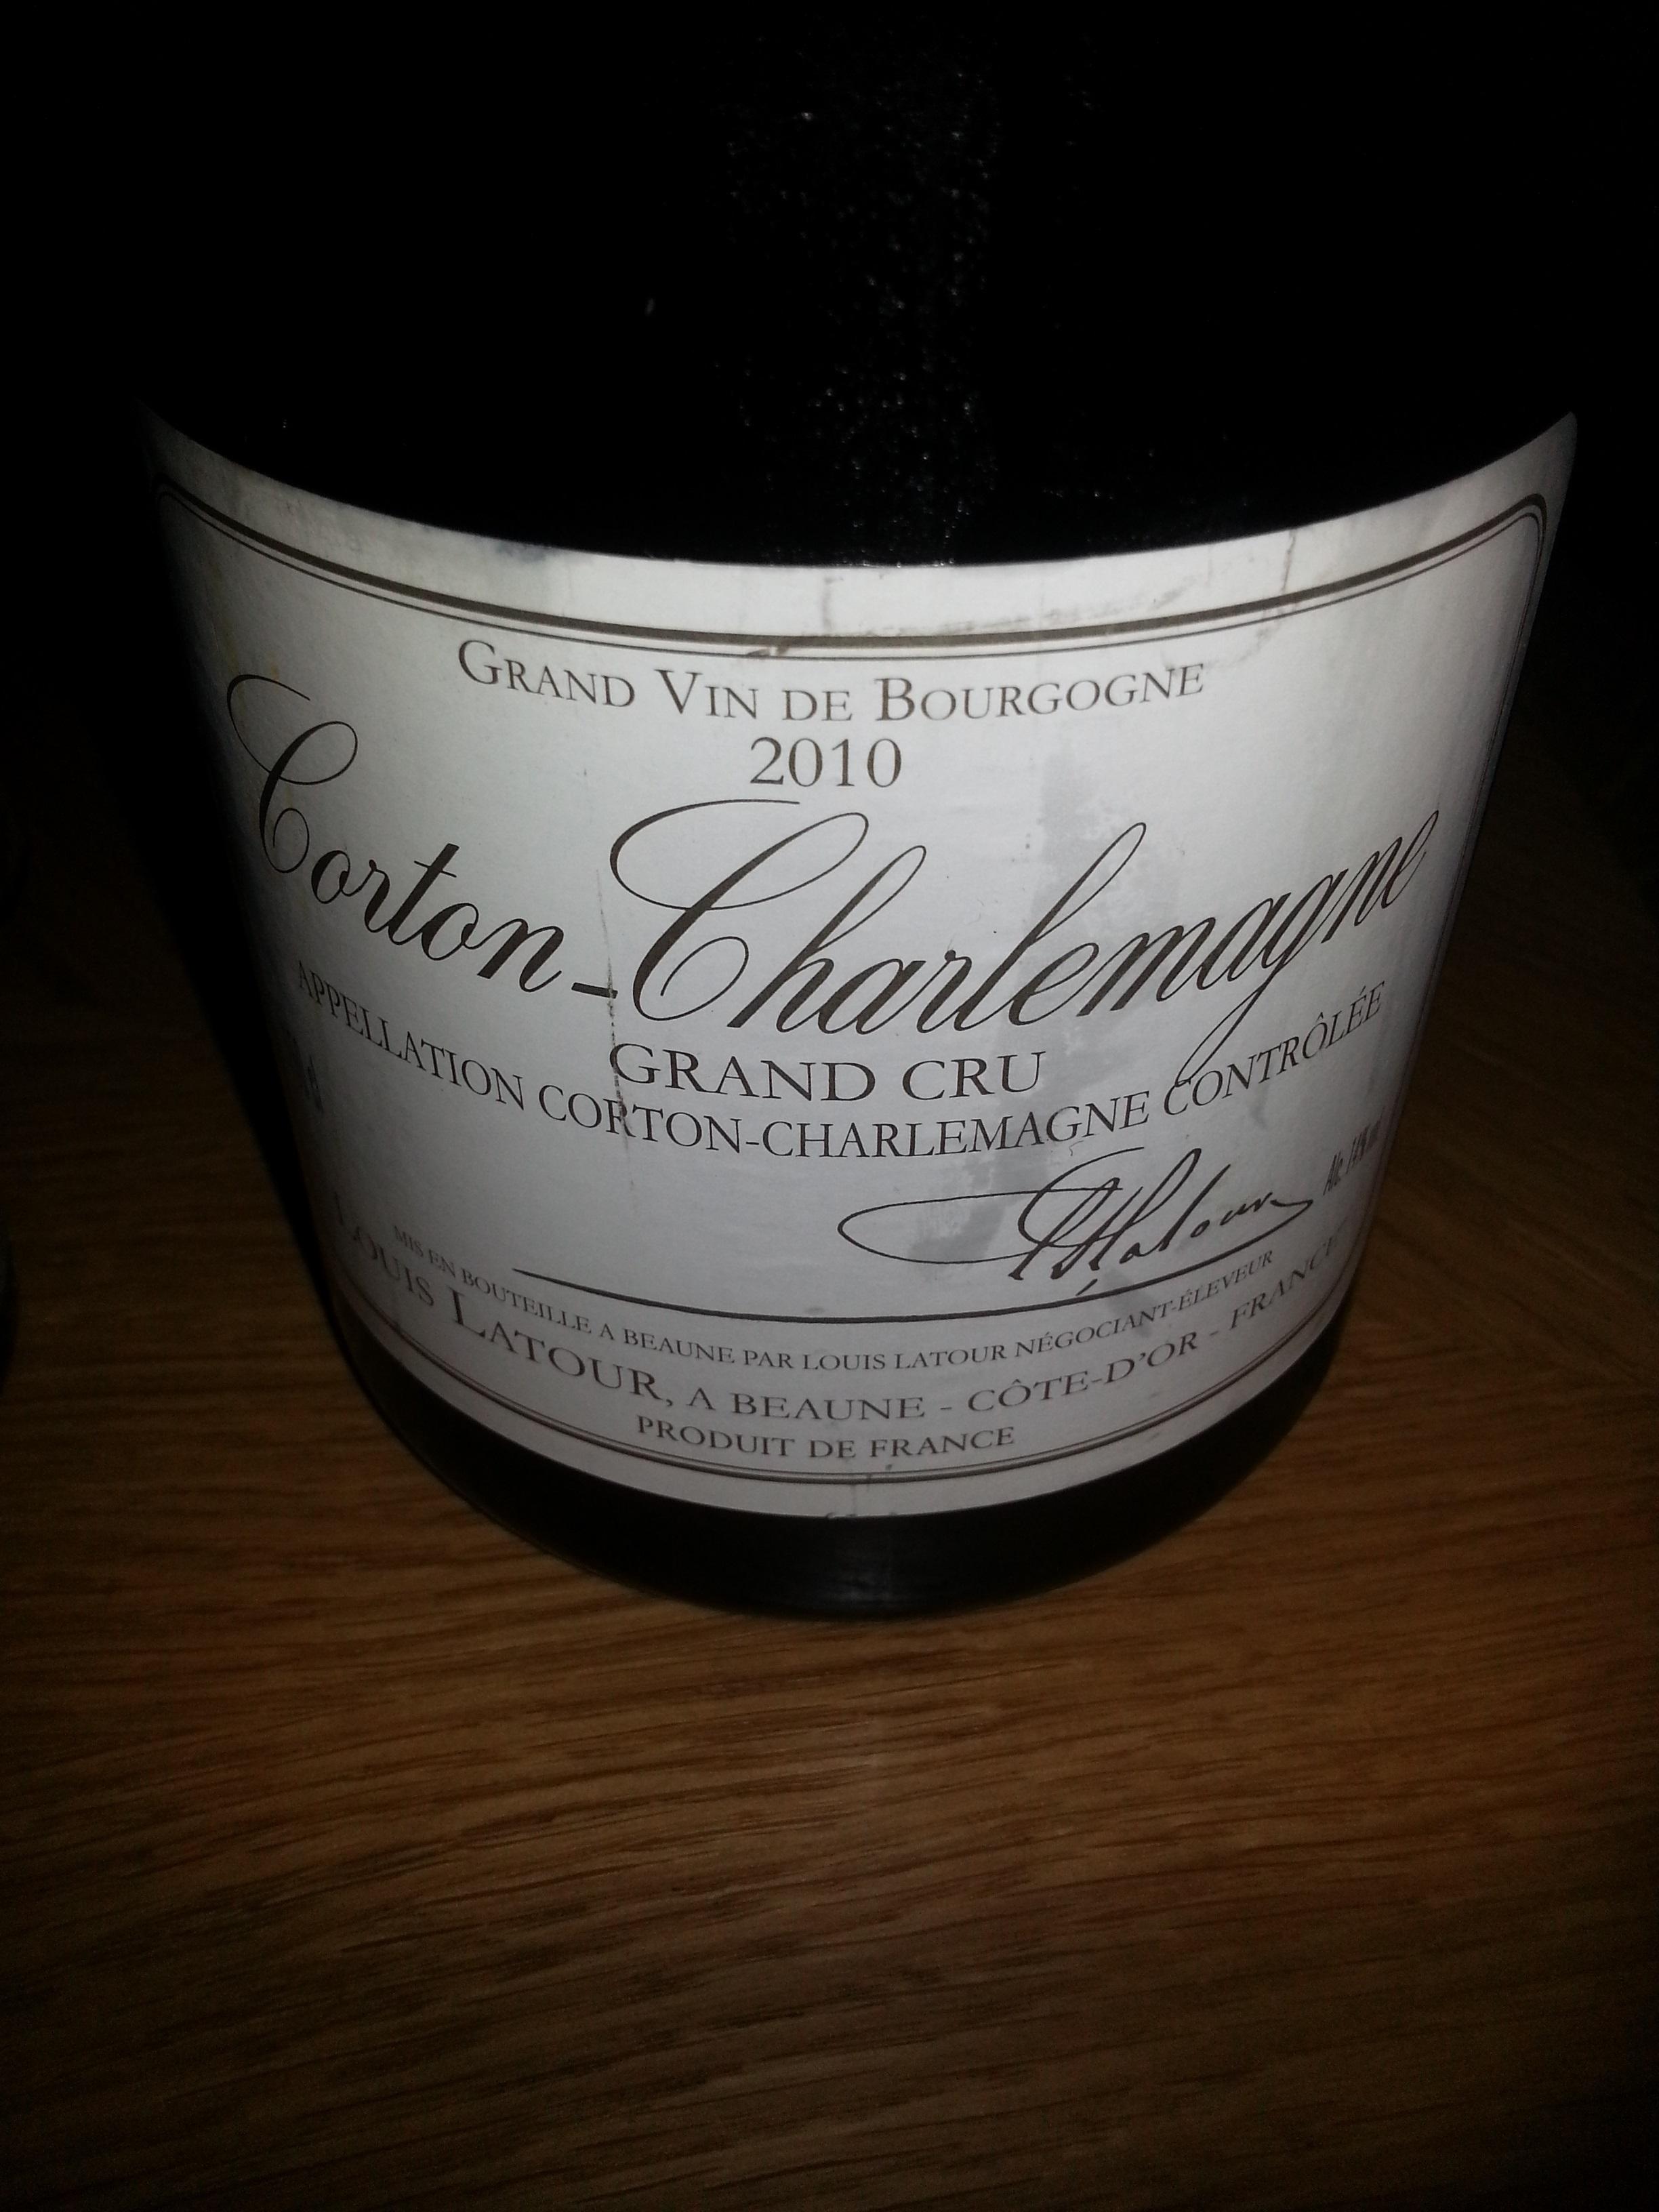 2010 Corton Charlemagne G.C. | Latour